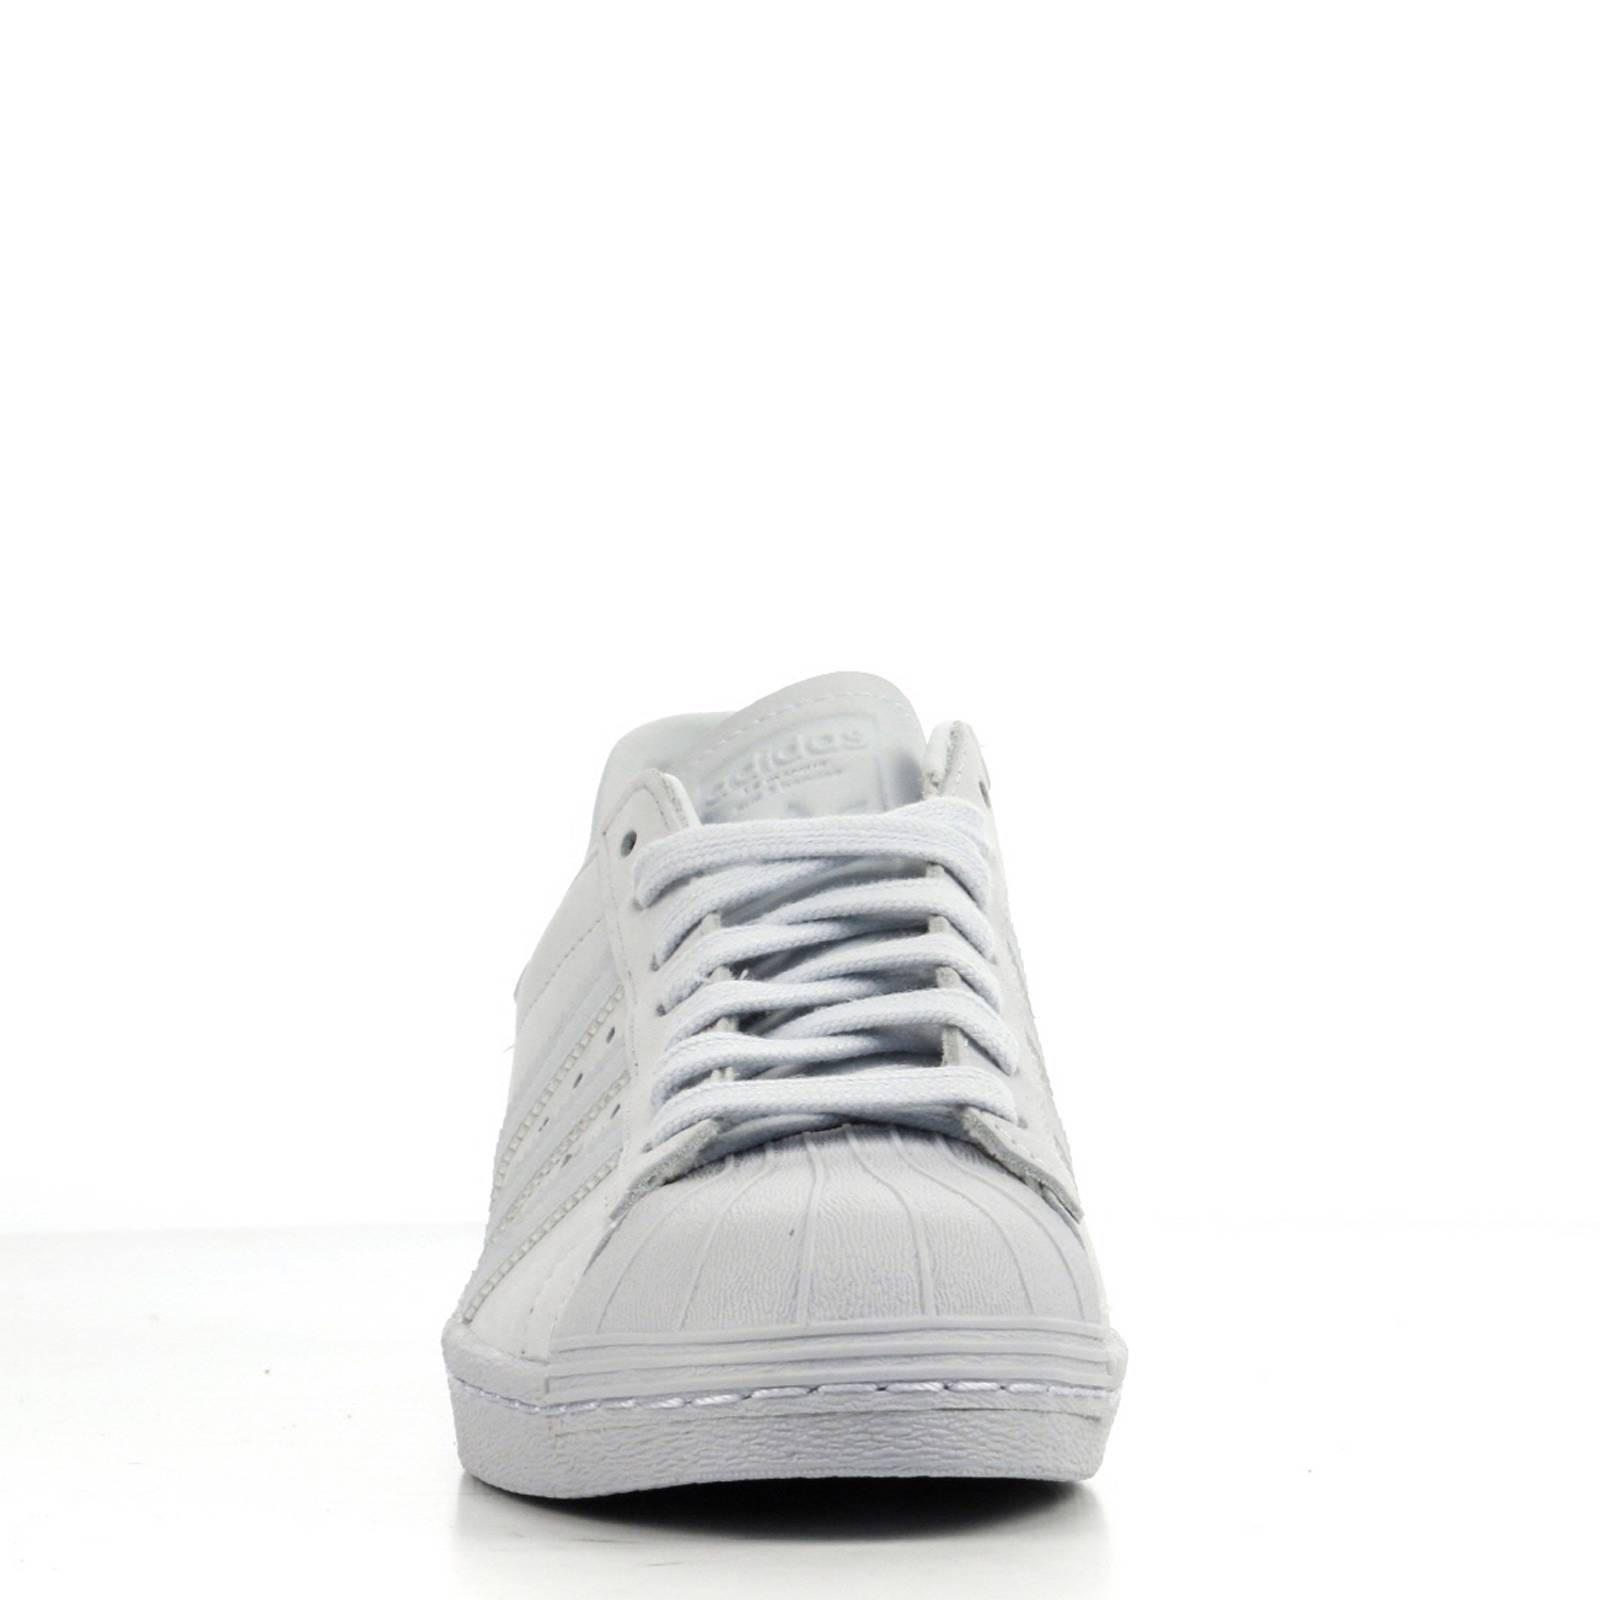 adidas superstar dames wehkamp